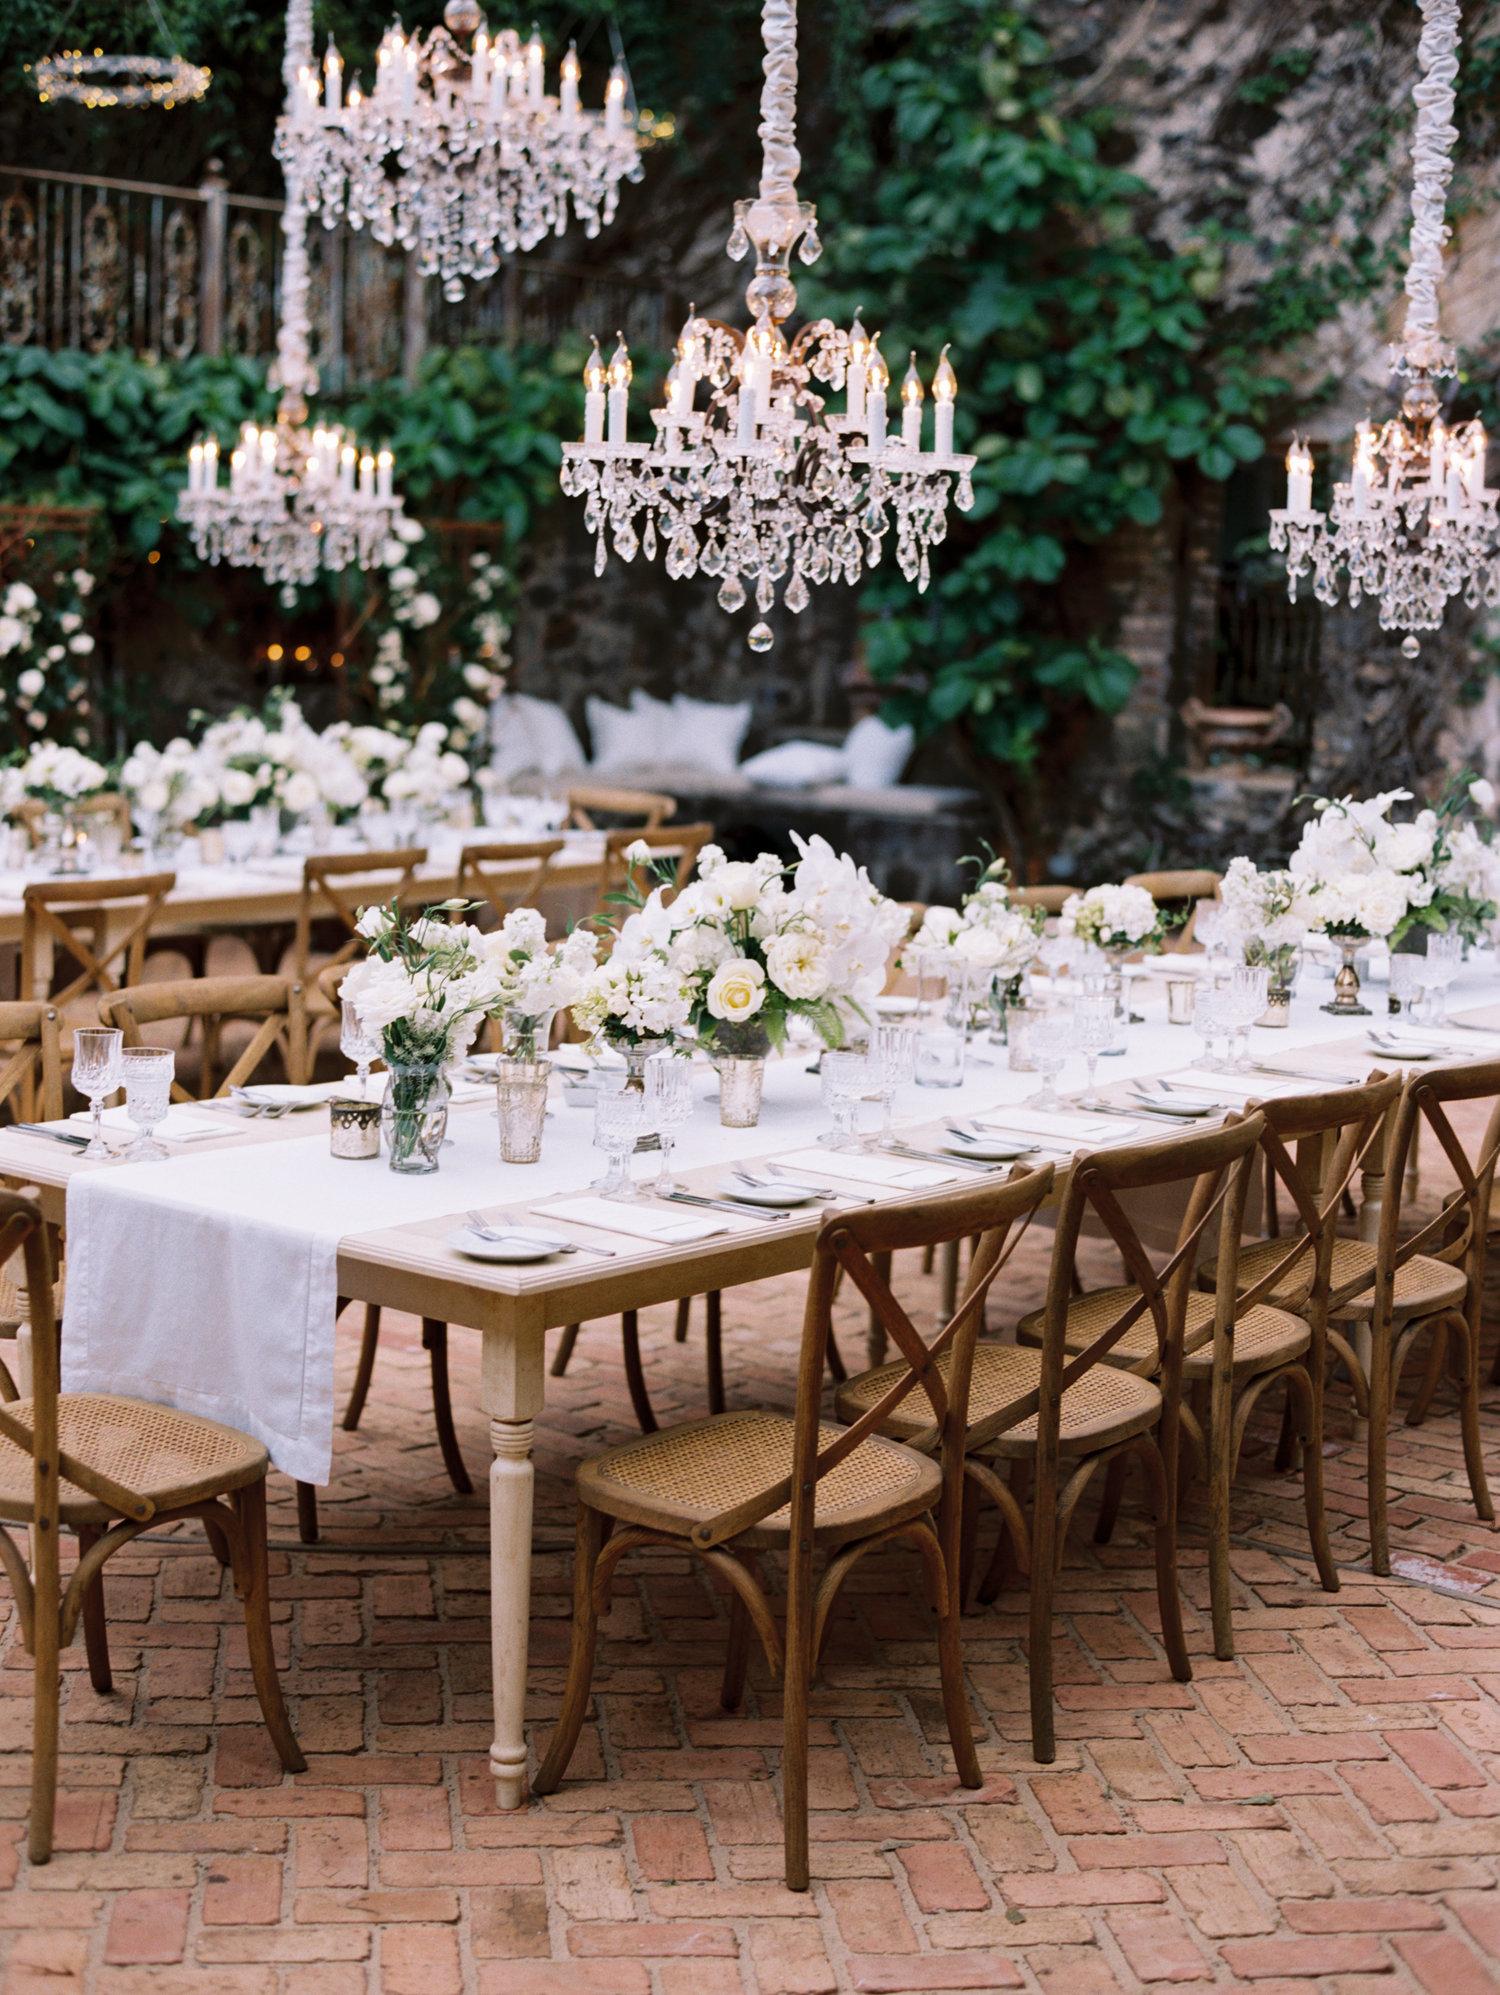 signature-maui-equipment-rentals-decor-for-weddings-in-maui-hawaii.jpg